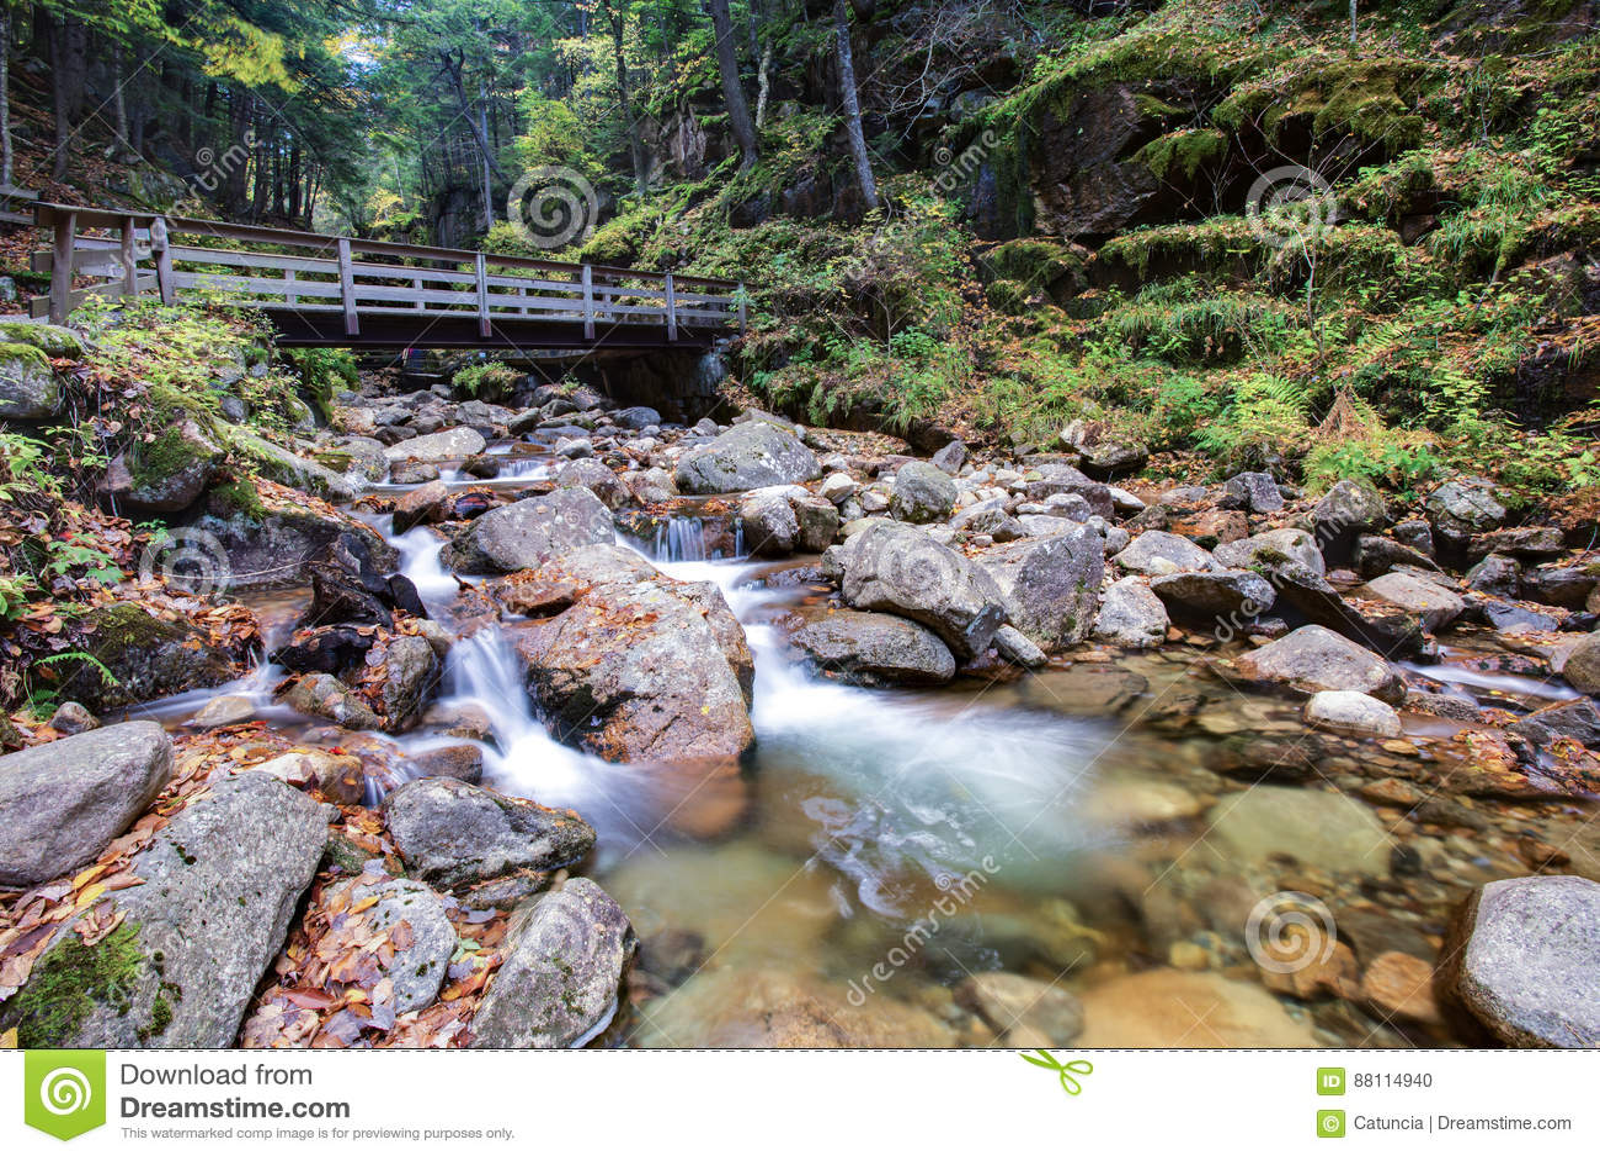 Parque de estado de la muesca de Franconia, New Hampshire, los E.E.U.U.